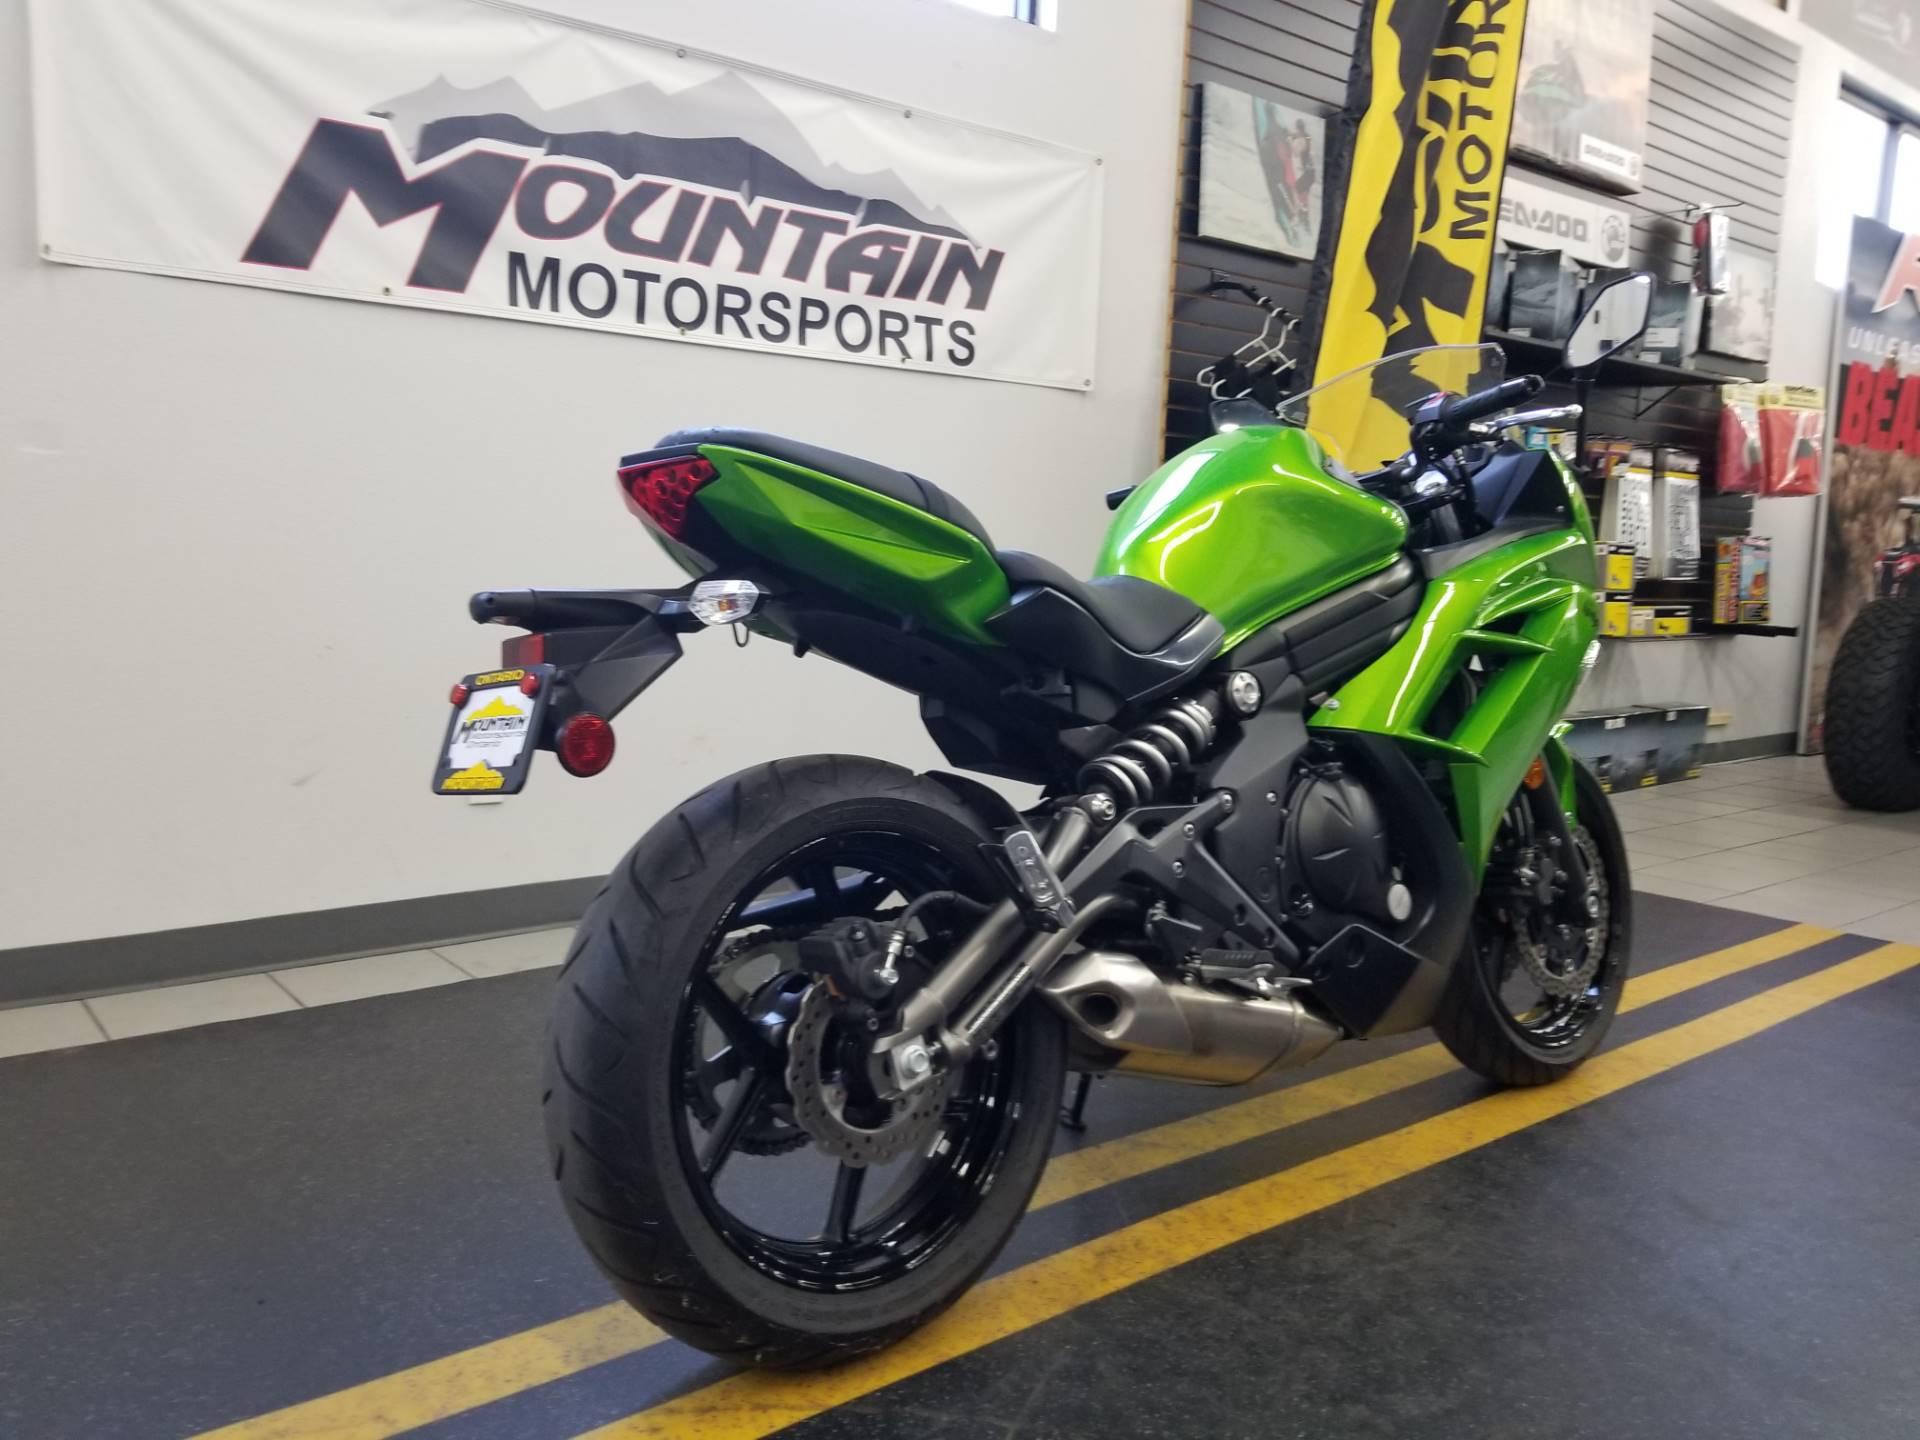 2012 Kawasaki Ninja 650 3